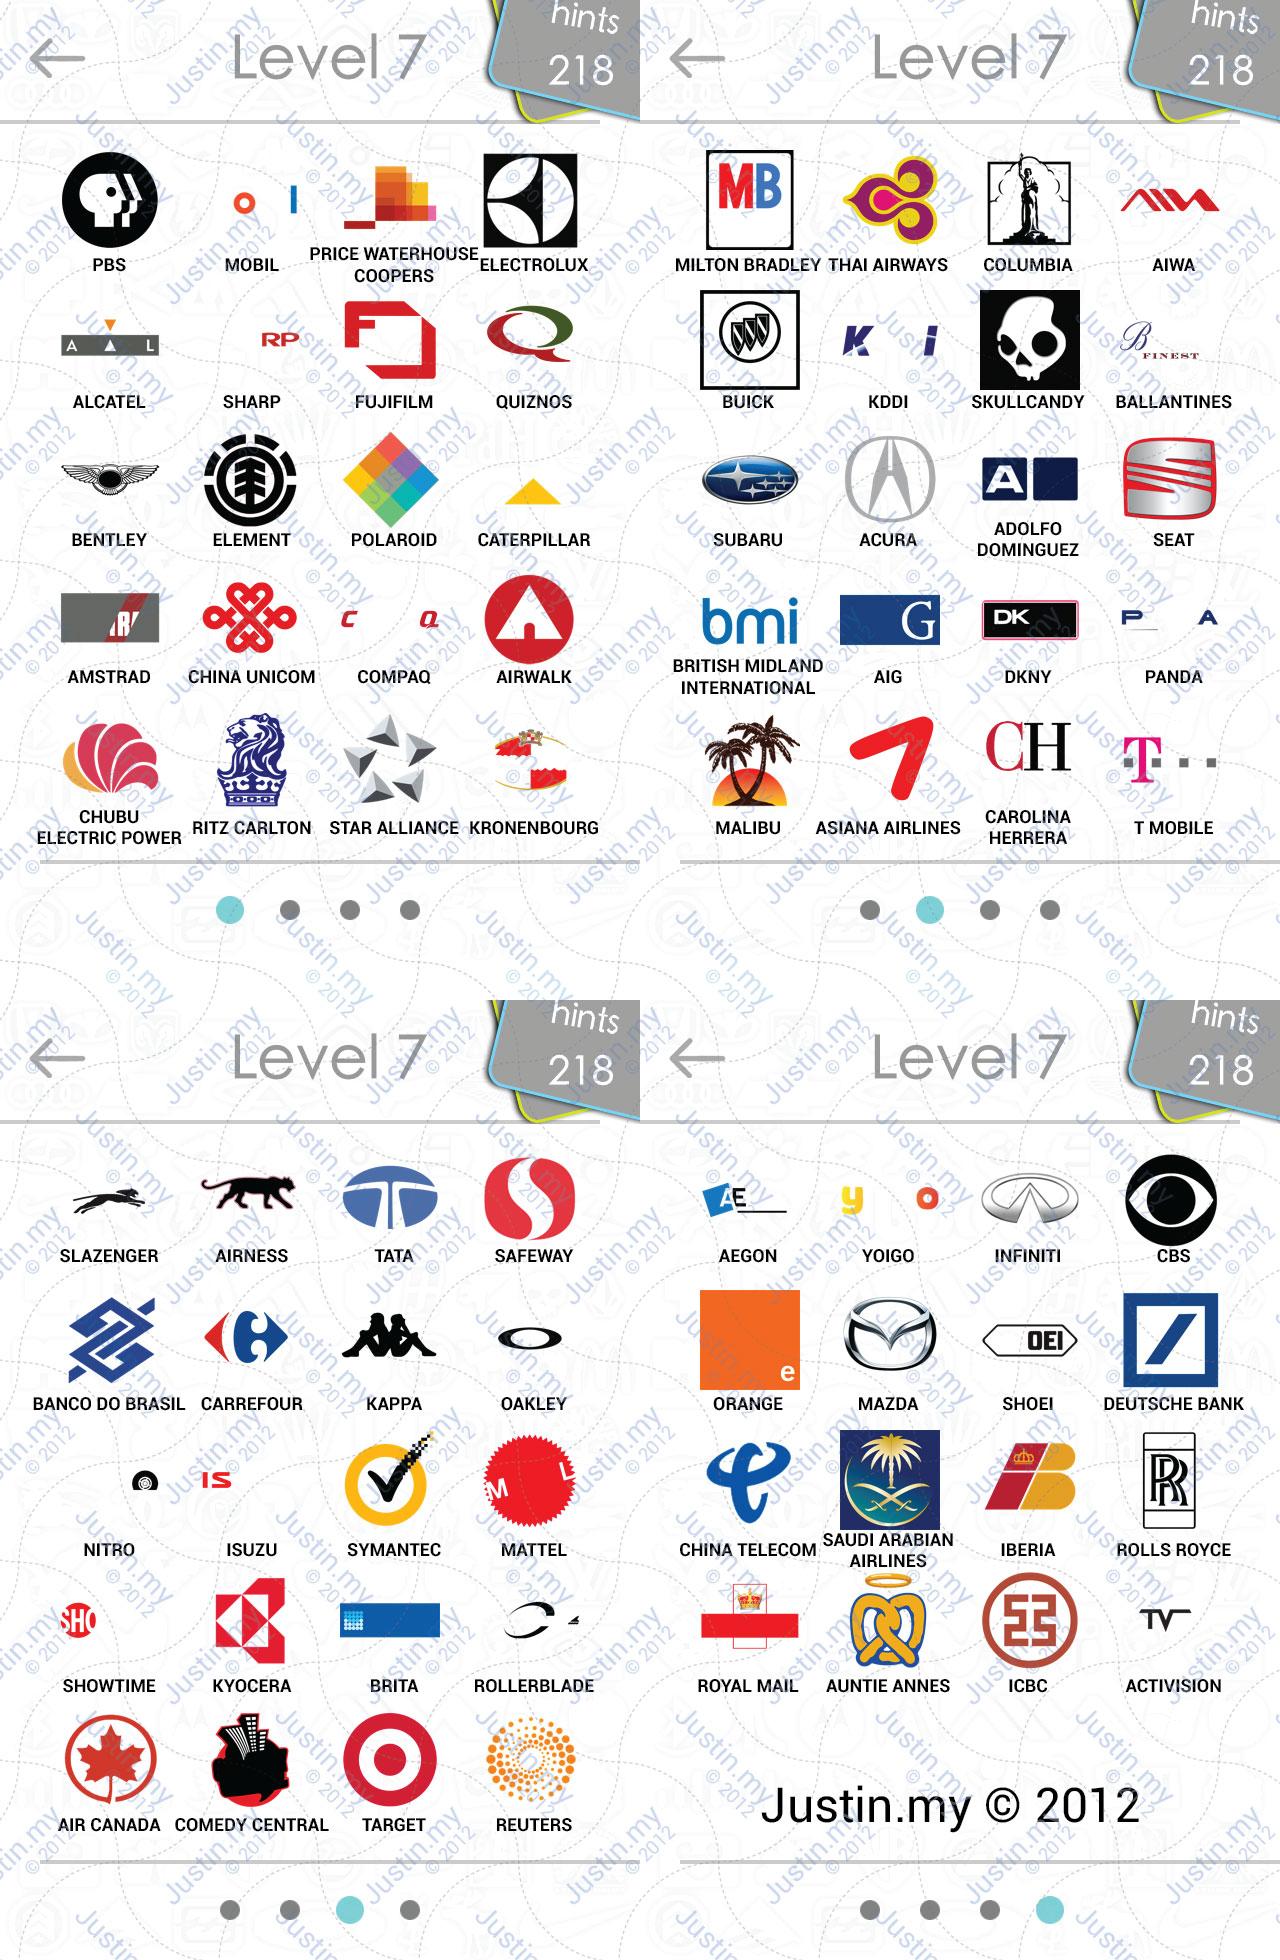 logos quiz answers � page 7 � justinmy